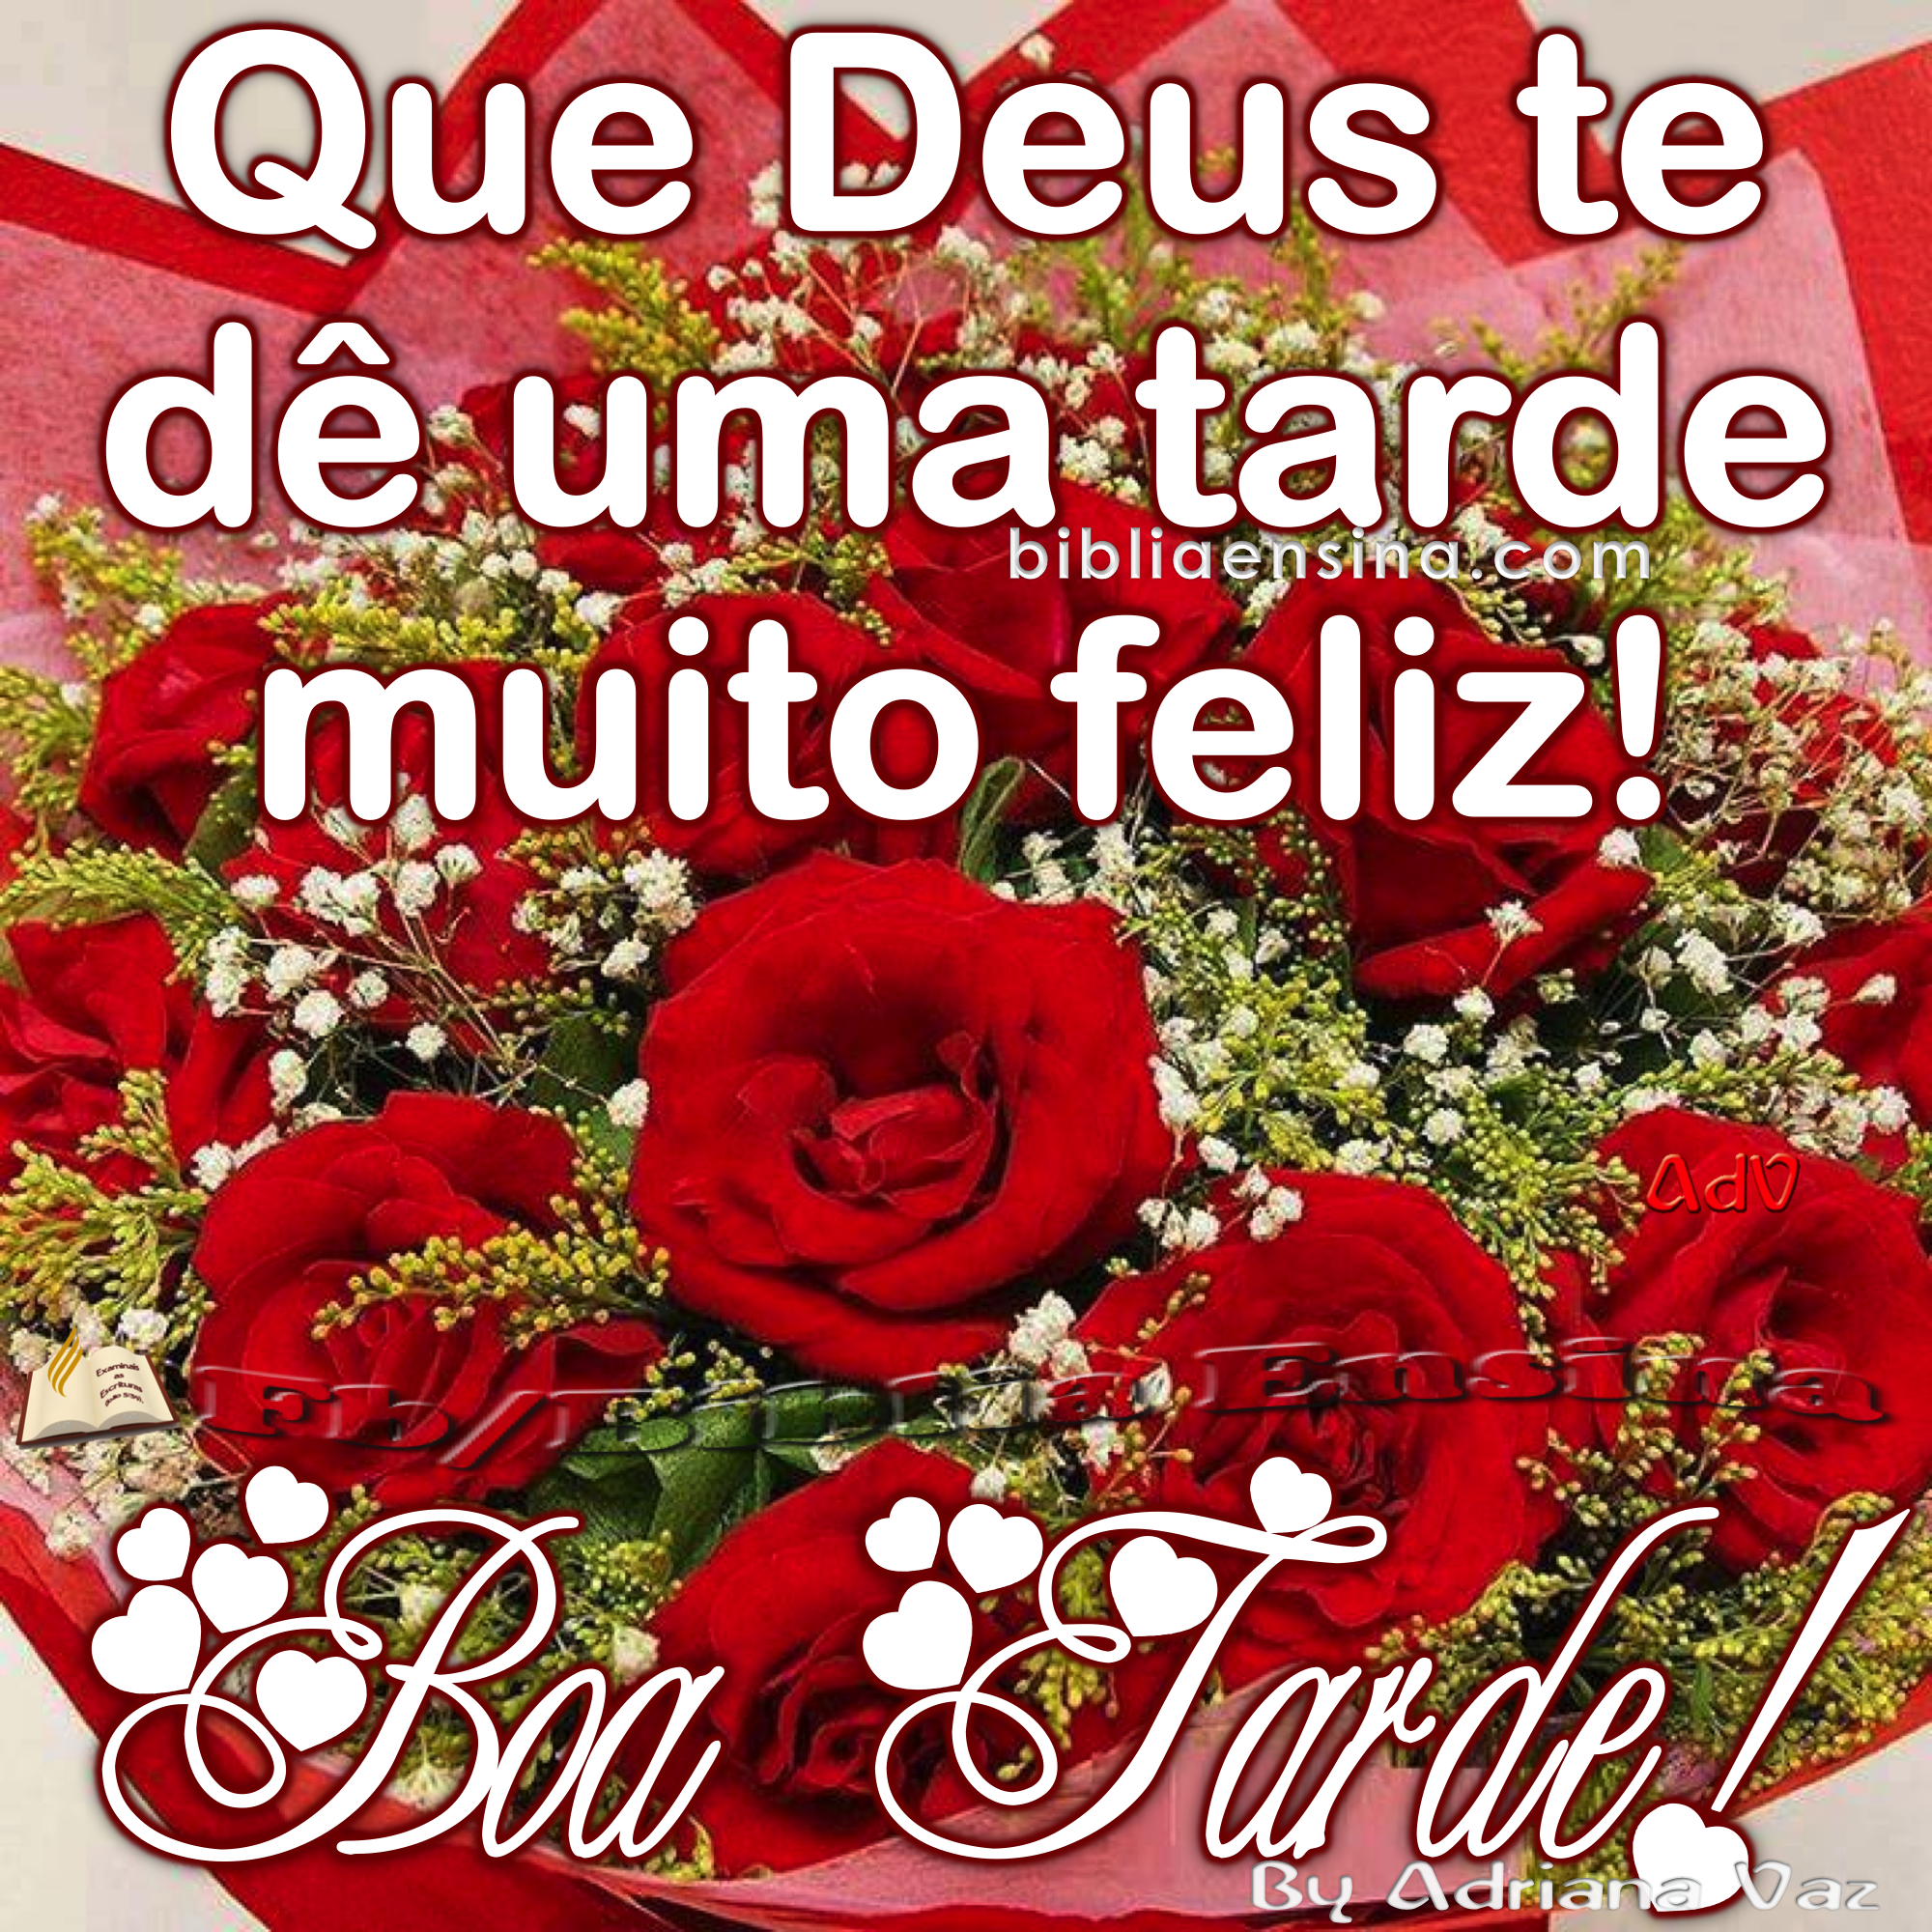 Boa Tarde_0004